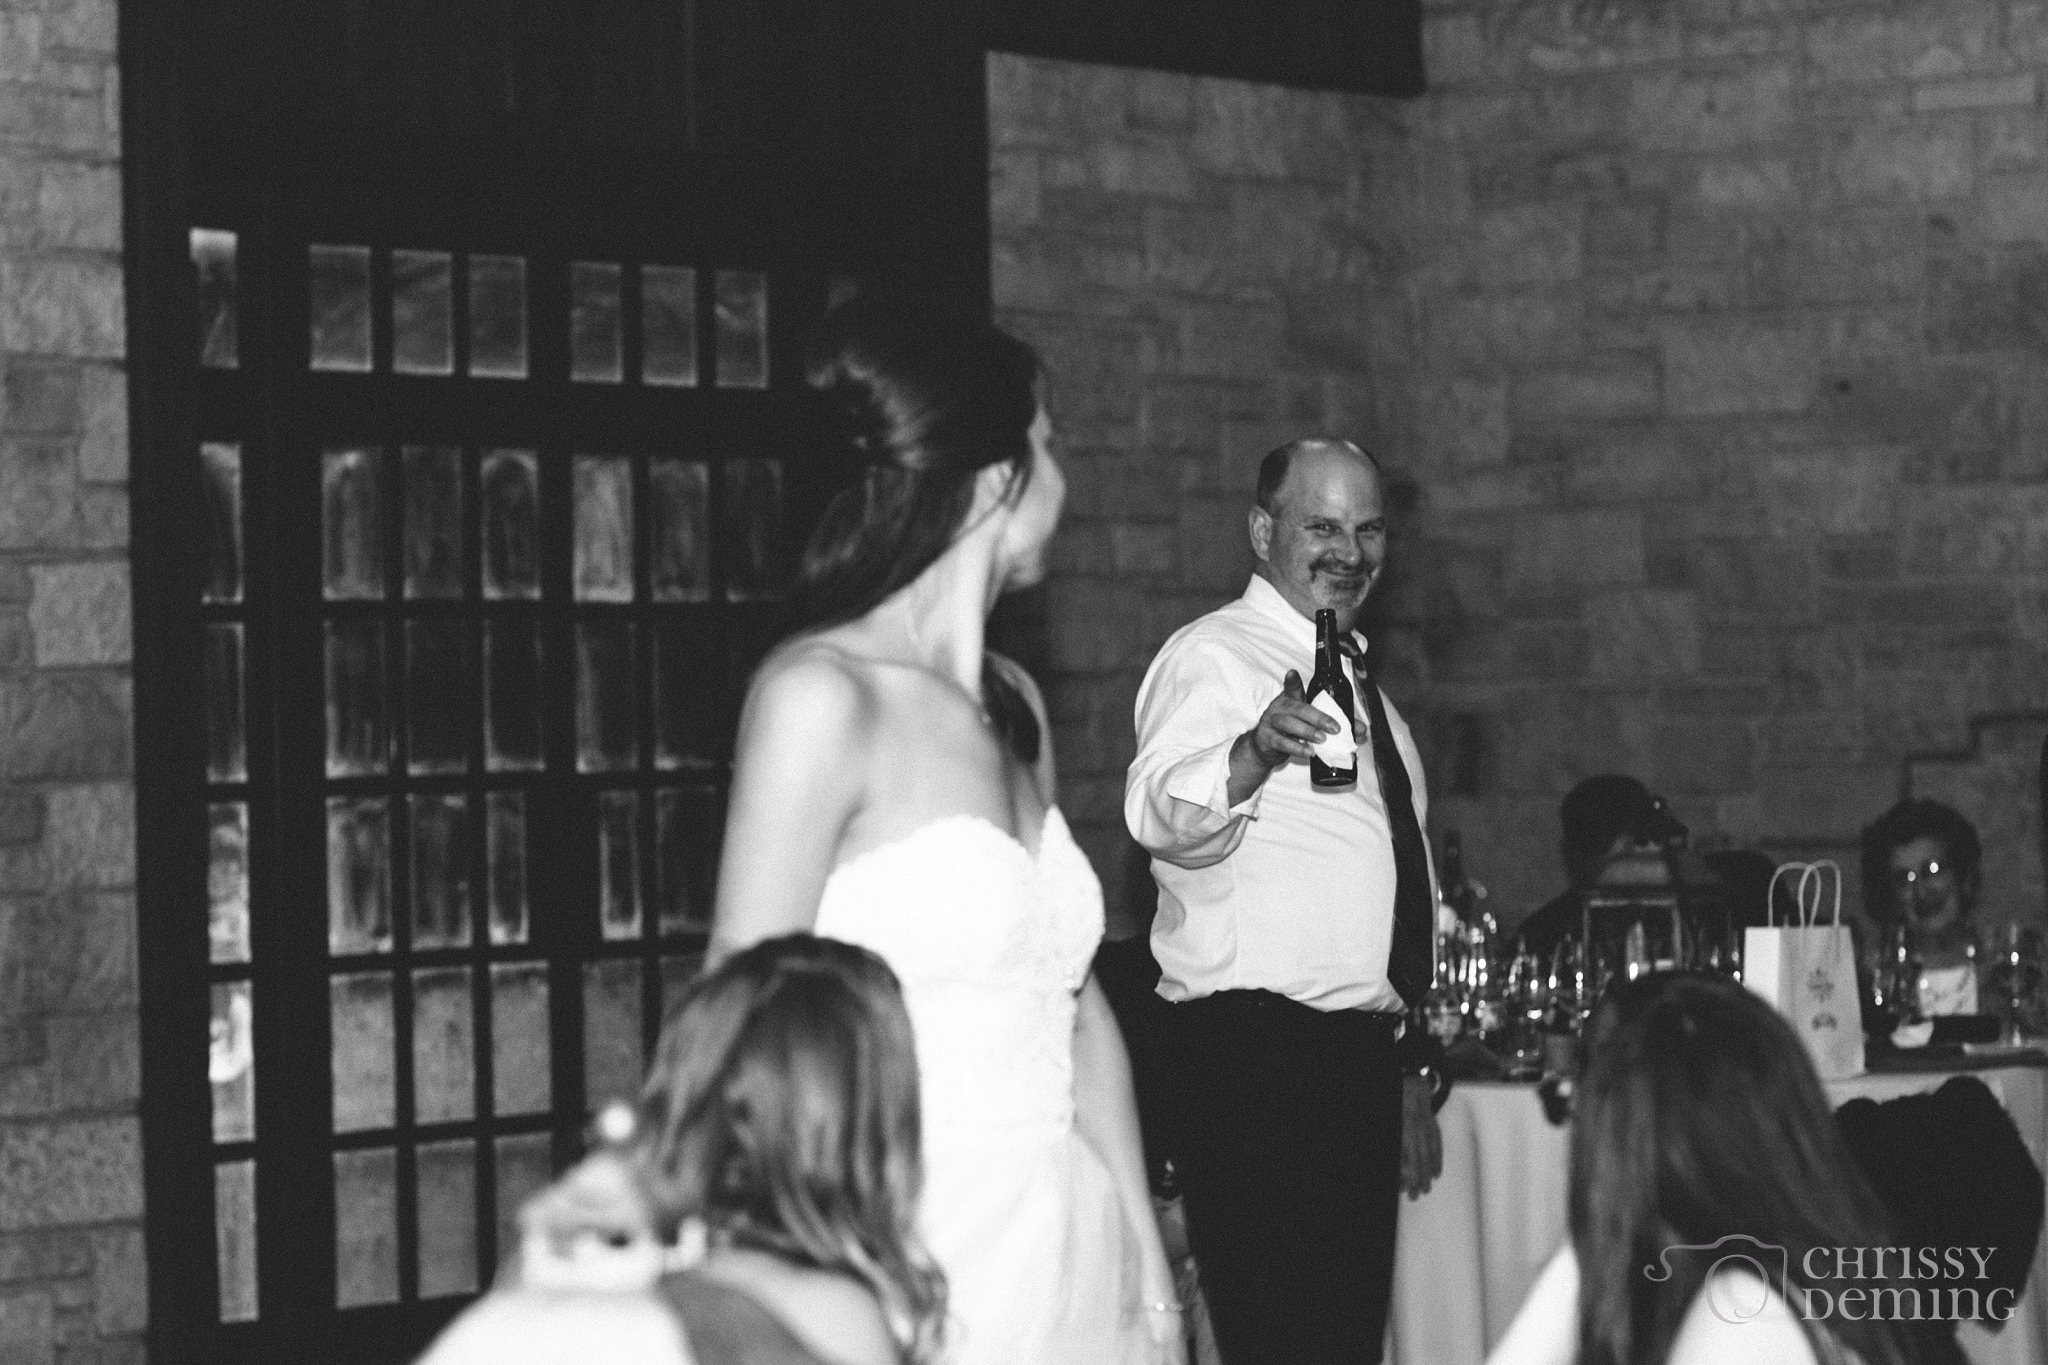 promontory_point_chicago_wedding_photography_0040.jpg